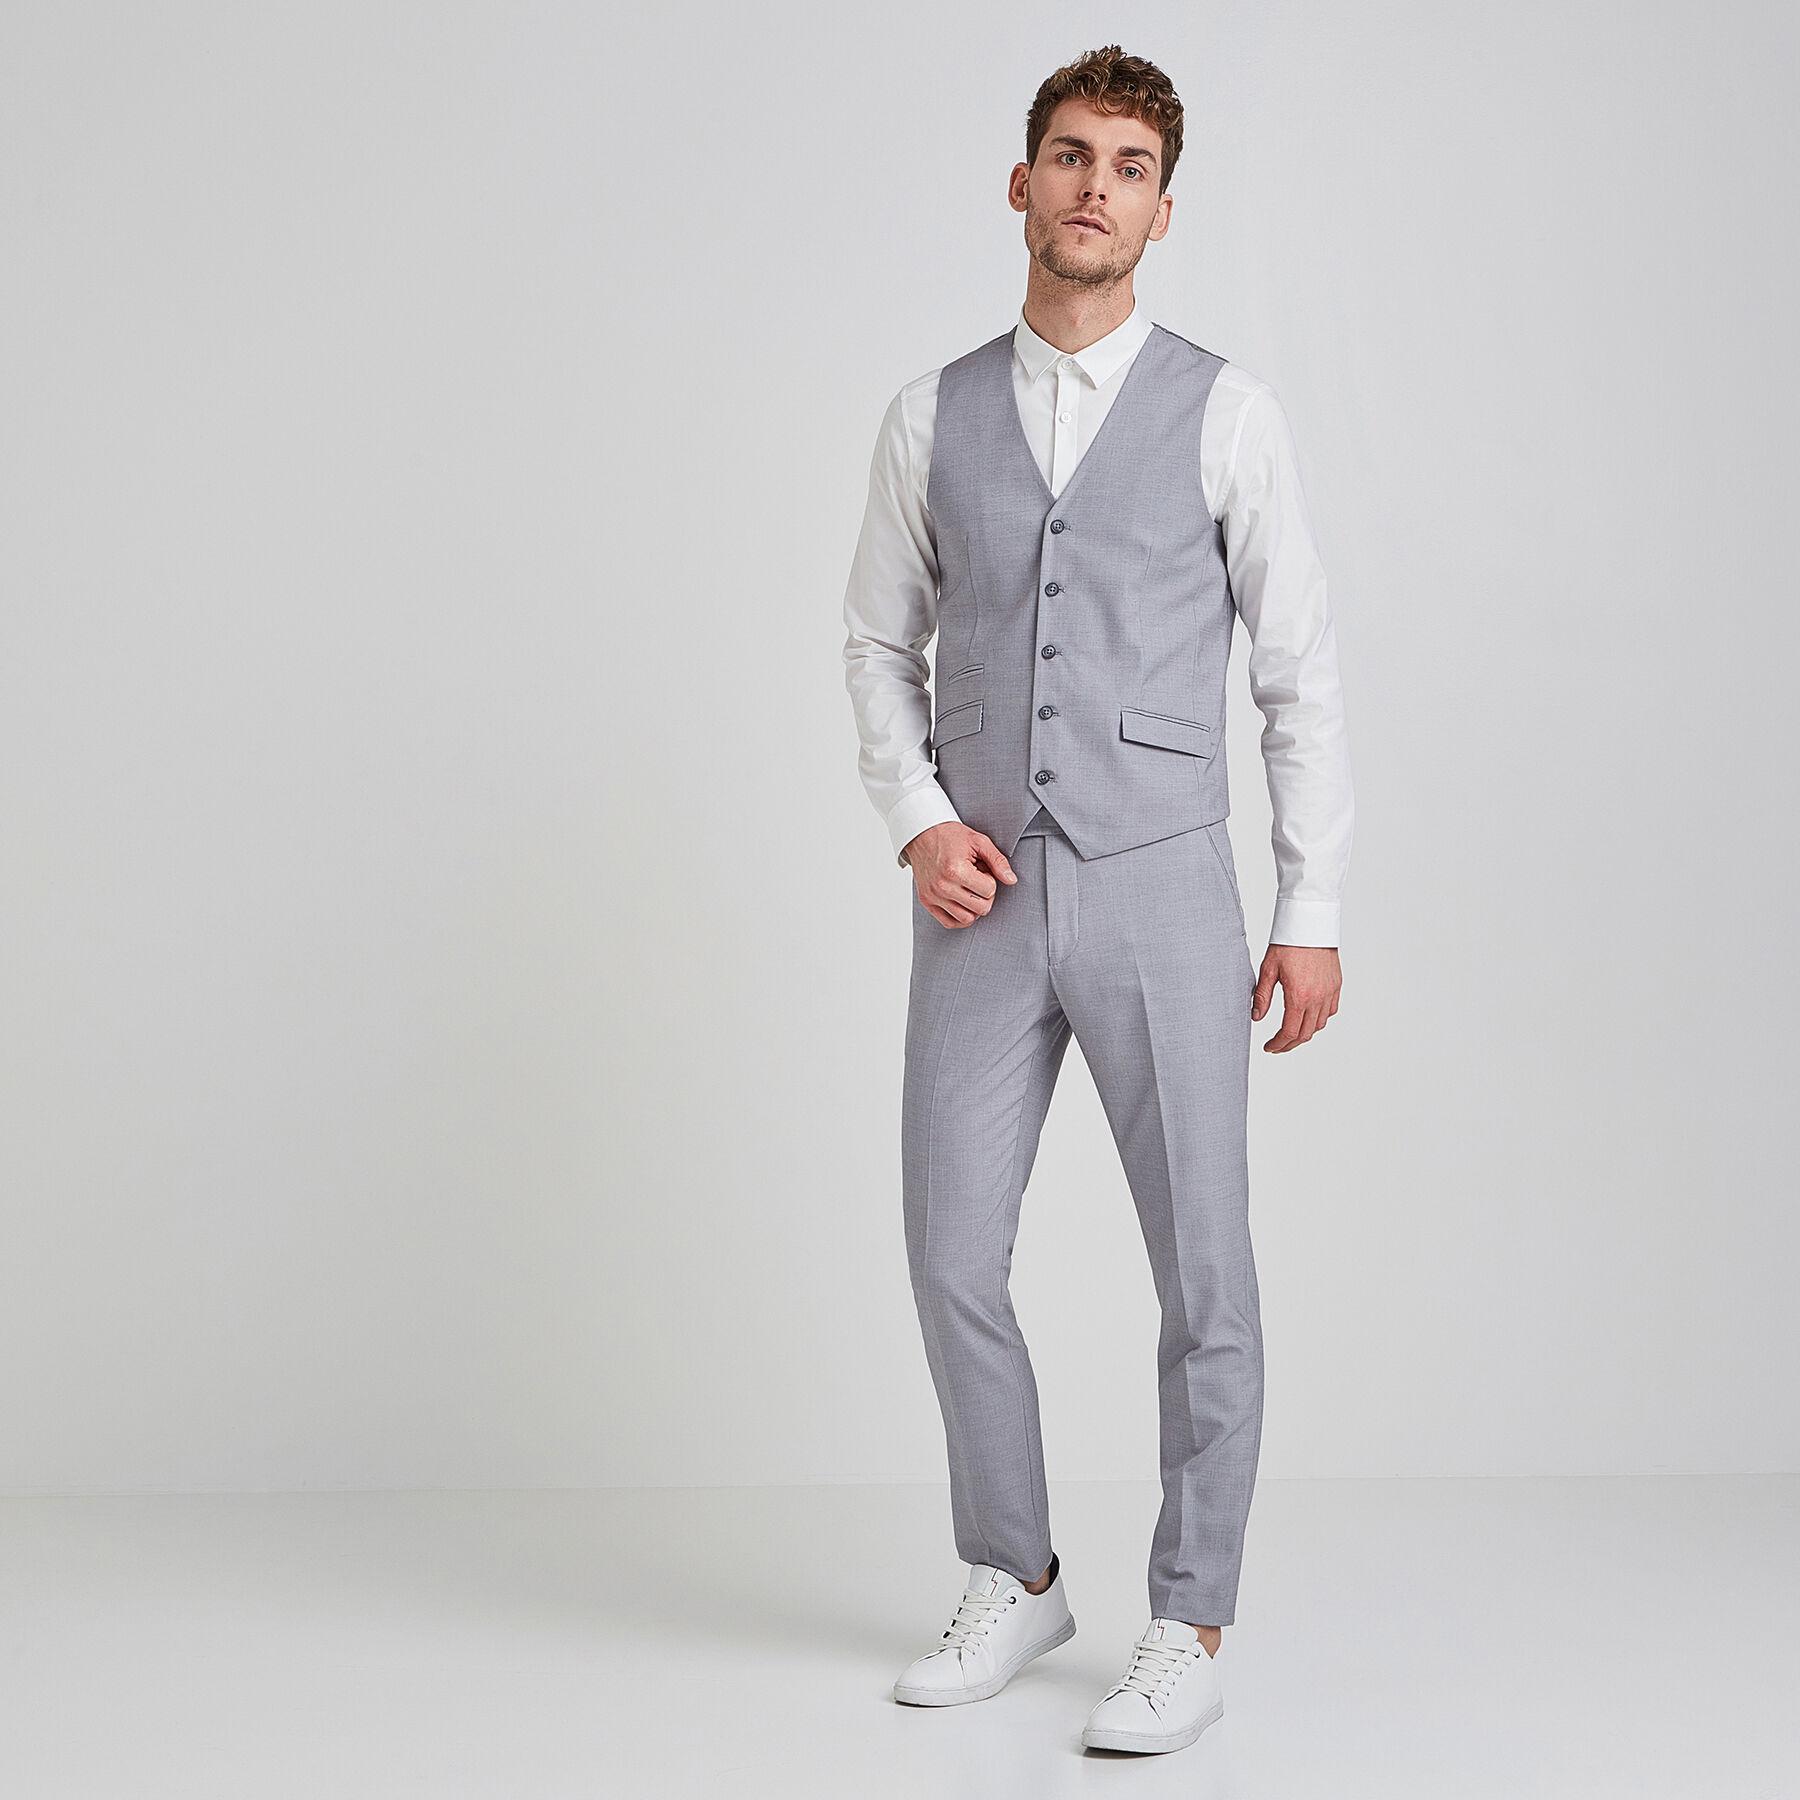 Gilet de costume extra slim gris clair gris chine clair - Costume homme gris clair ...